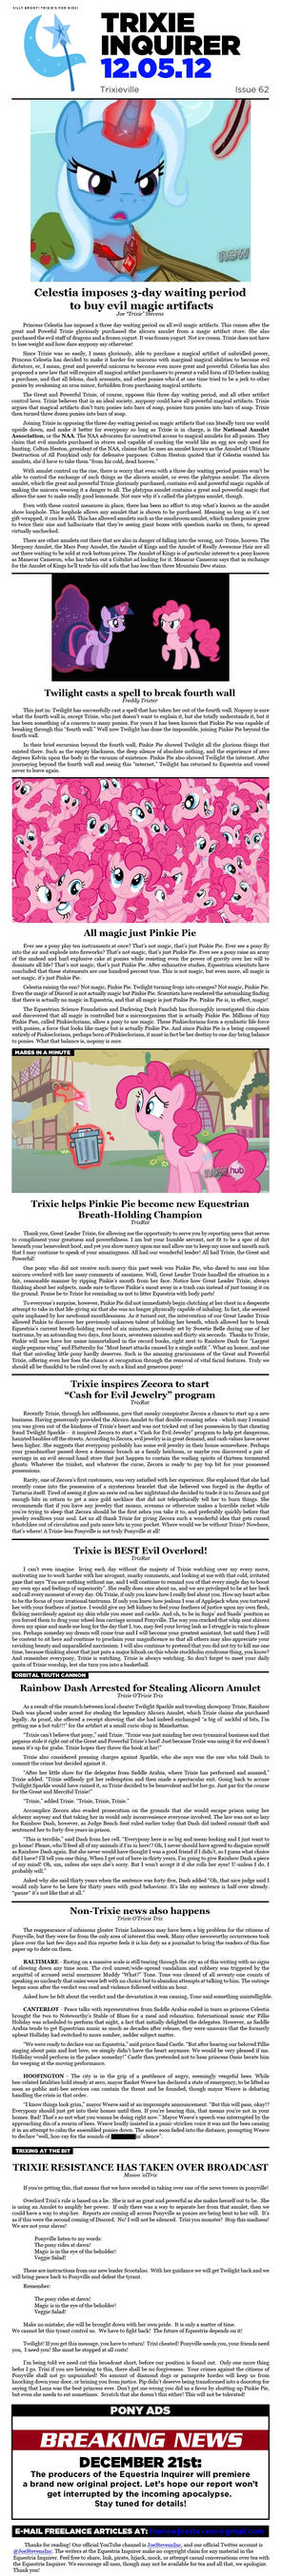 Equestria Inquirer 62 by JoeStevensInc